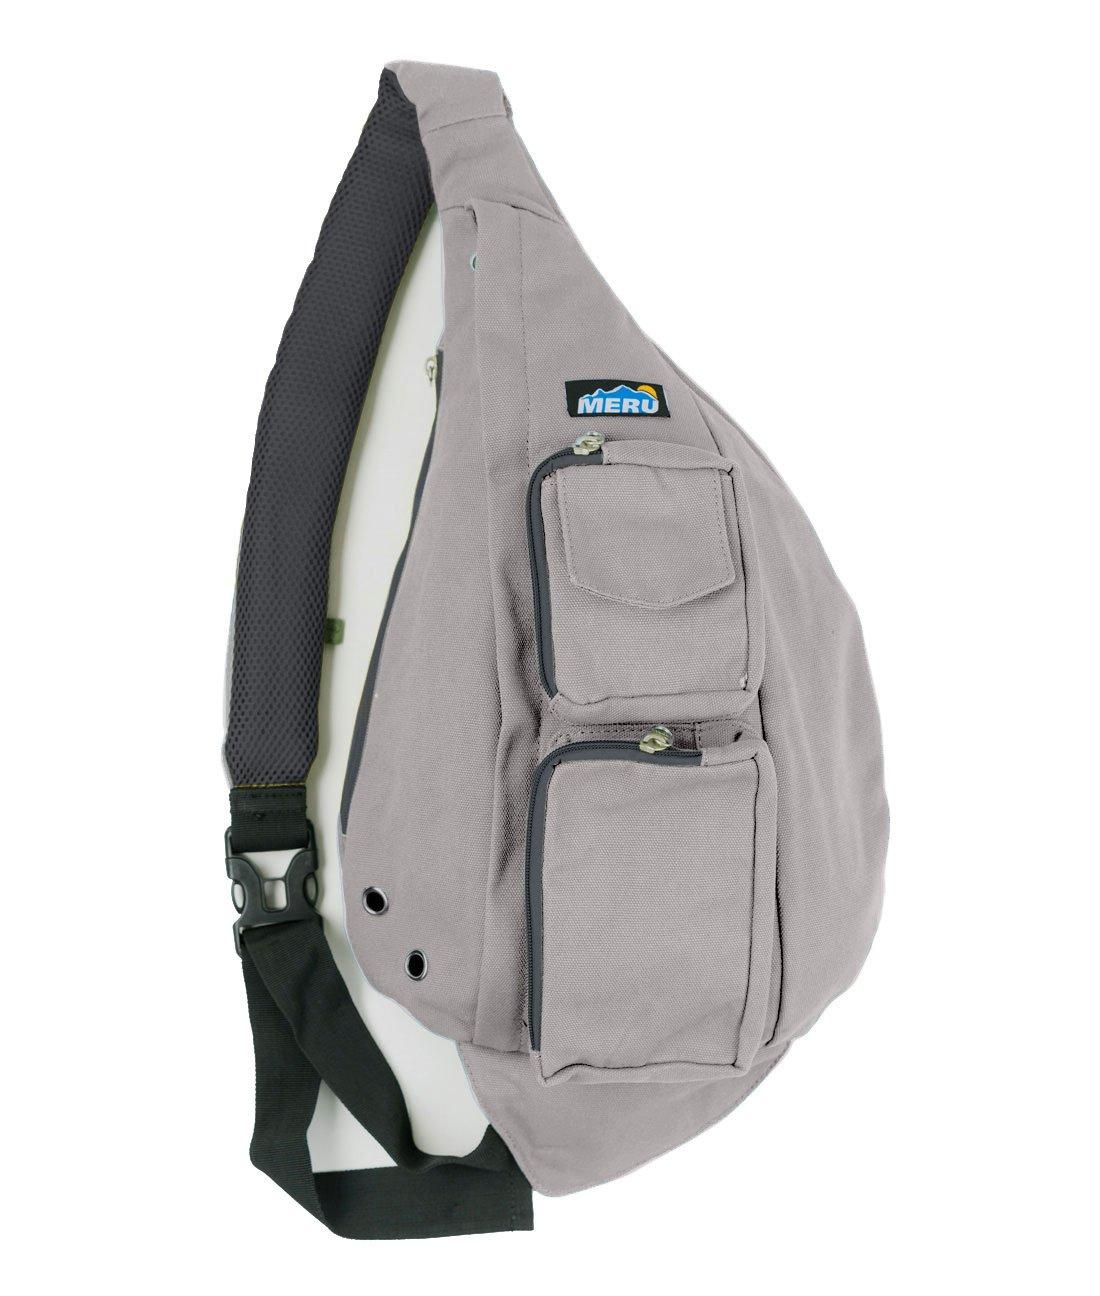 Meru Sling Backpack Bag Small Single Strap Crossbody Pack for Women and Men